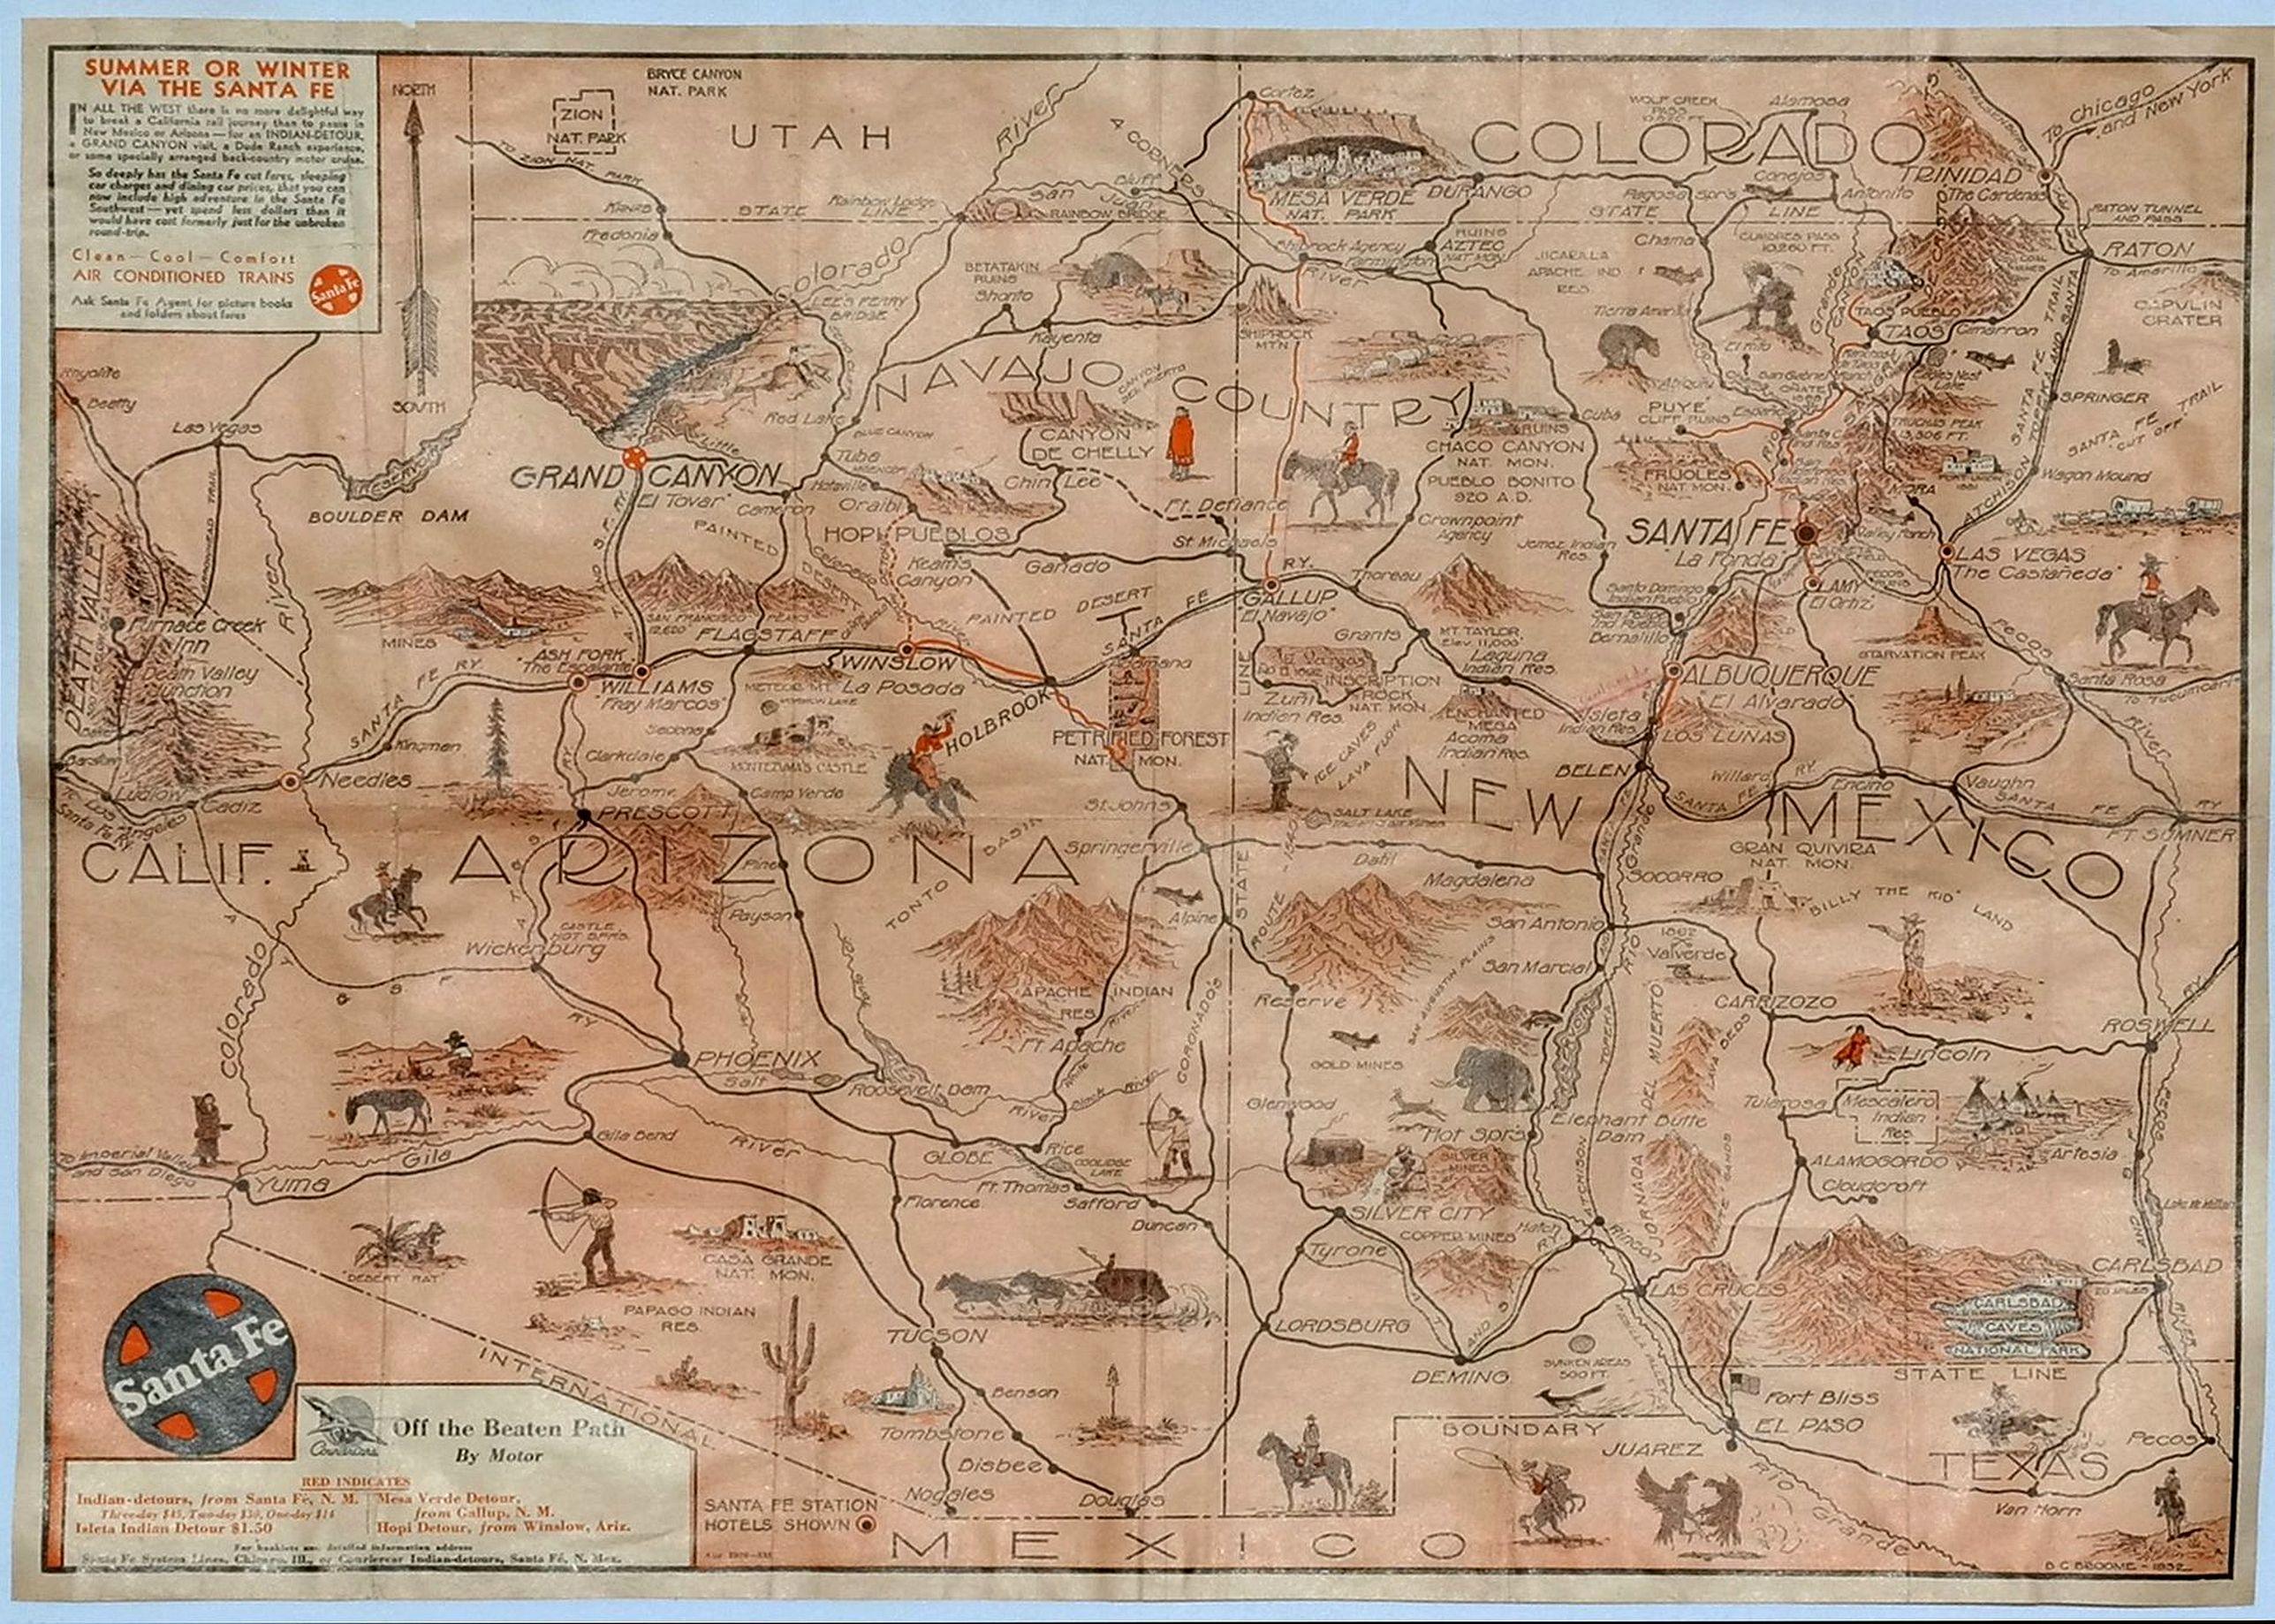 SANTE FE RAILWAY. - Sante Fe Railway Map – (No Title)